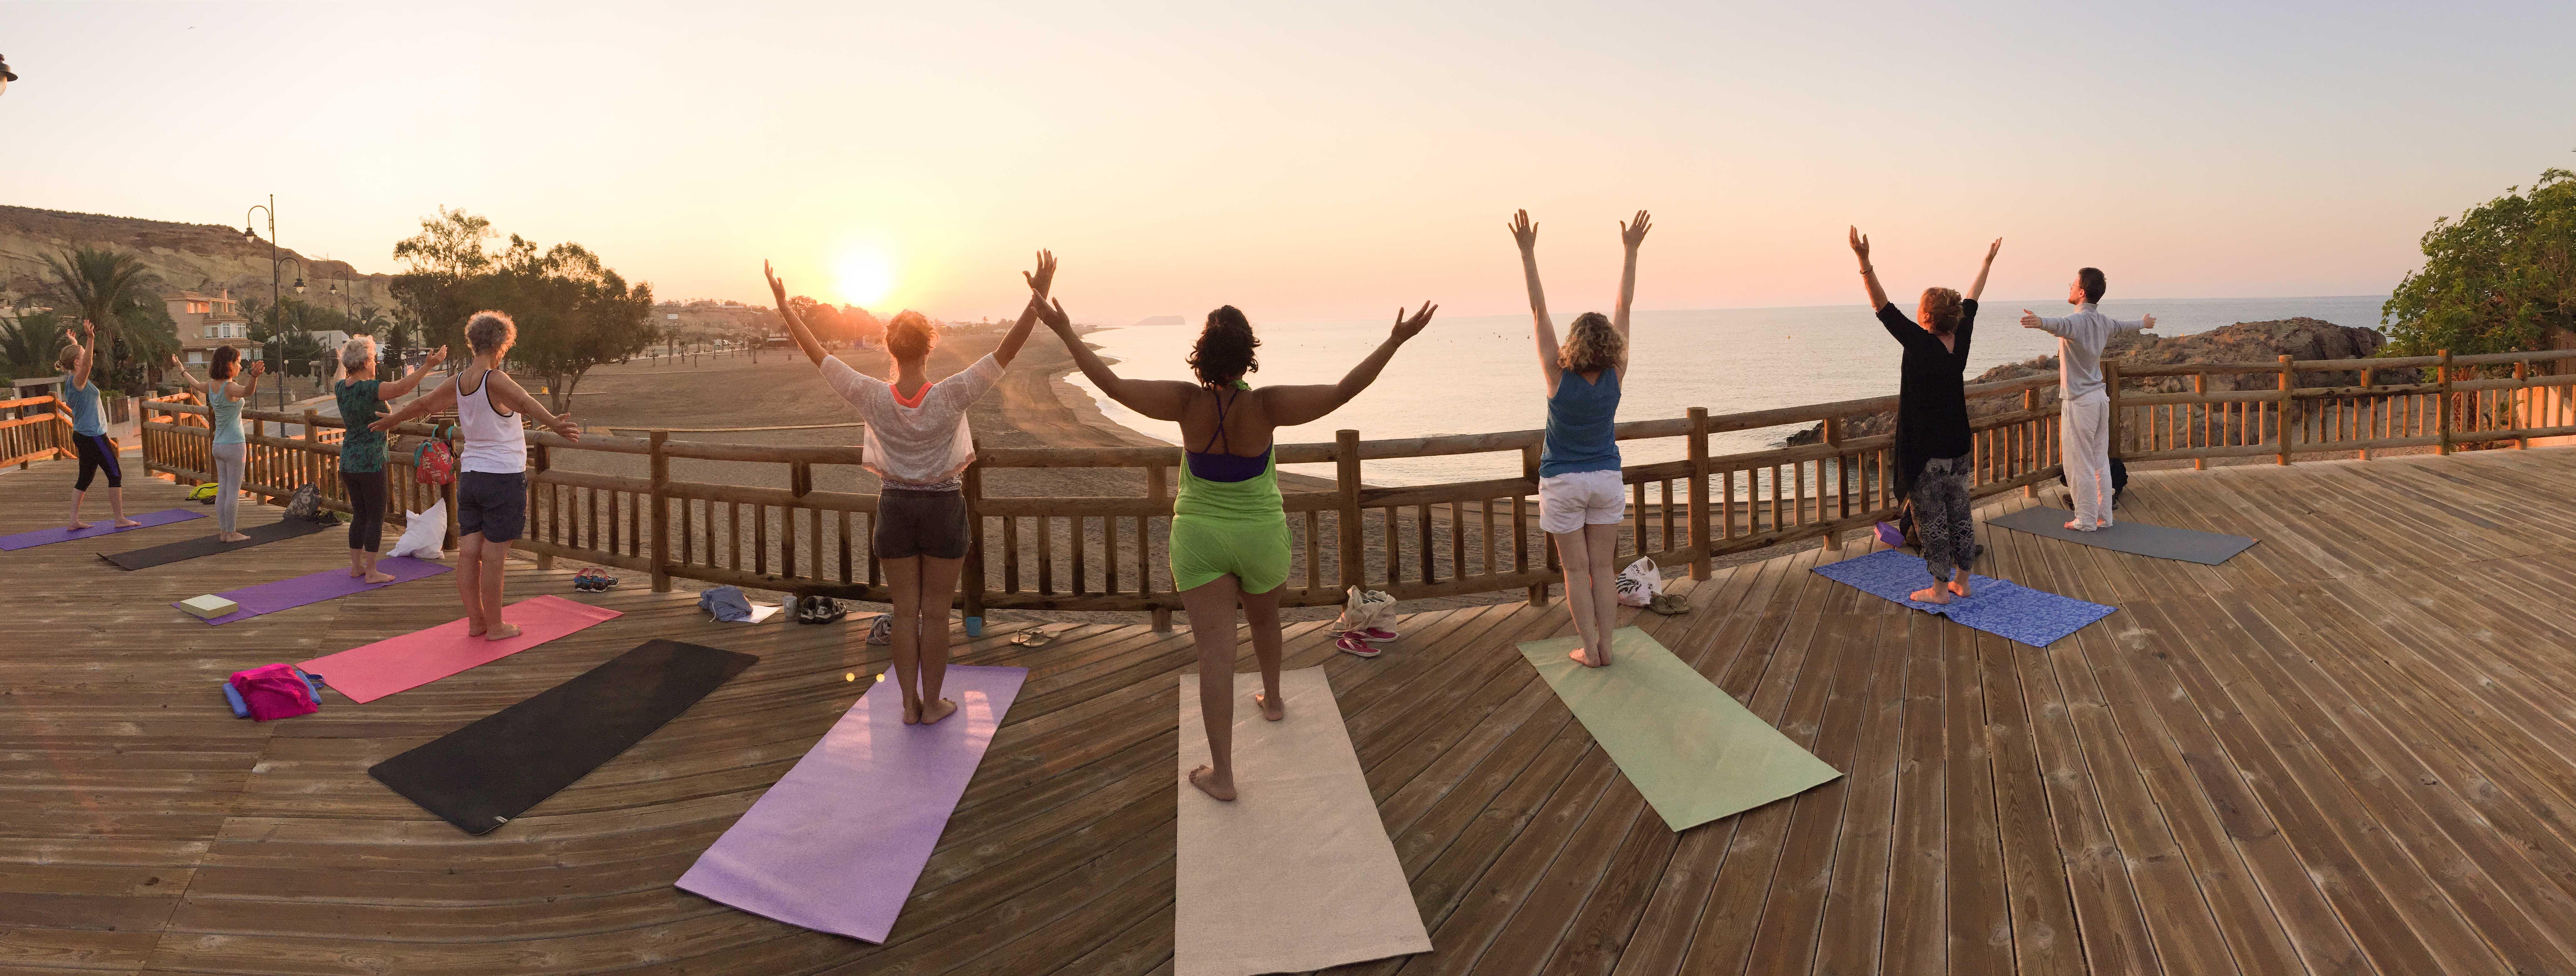 Sunrise Yoga spain- murcia 2015